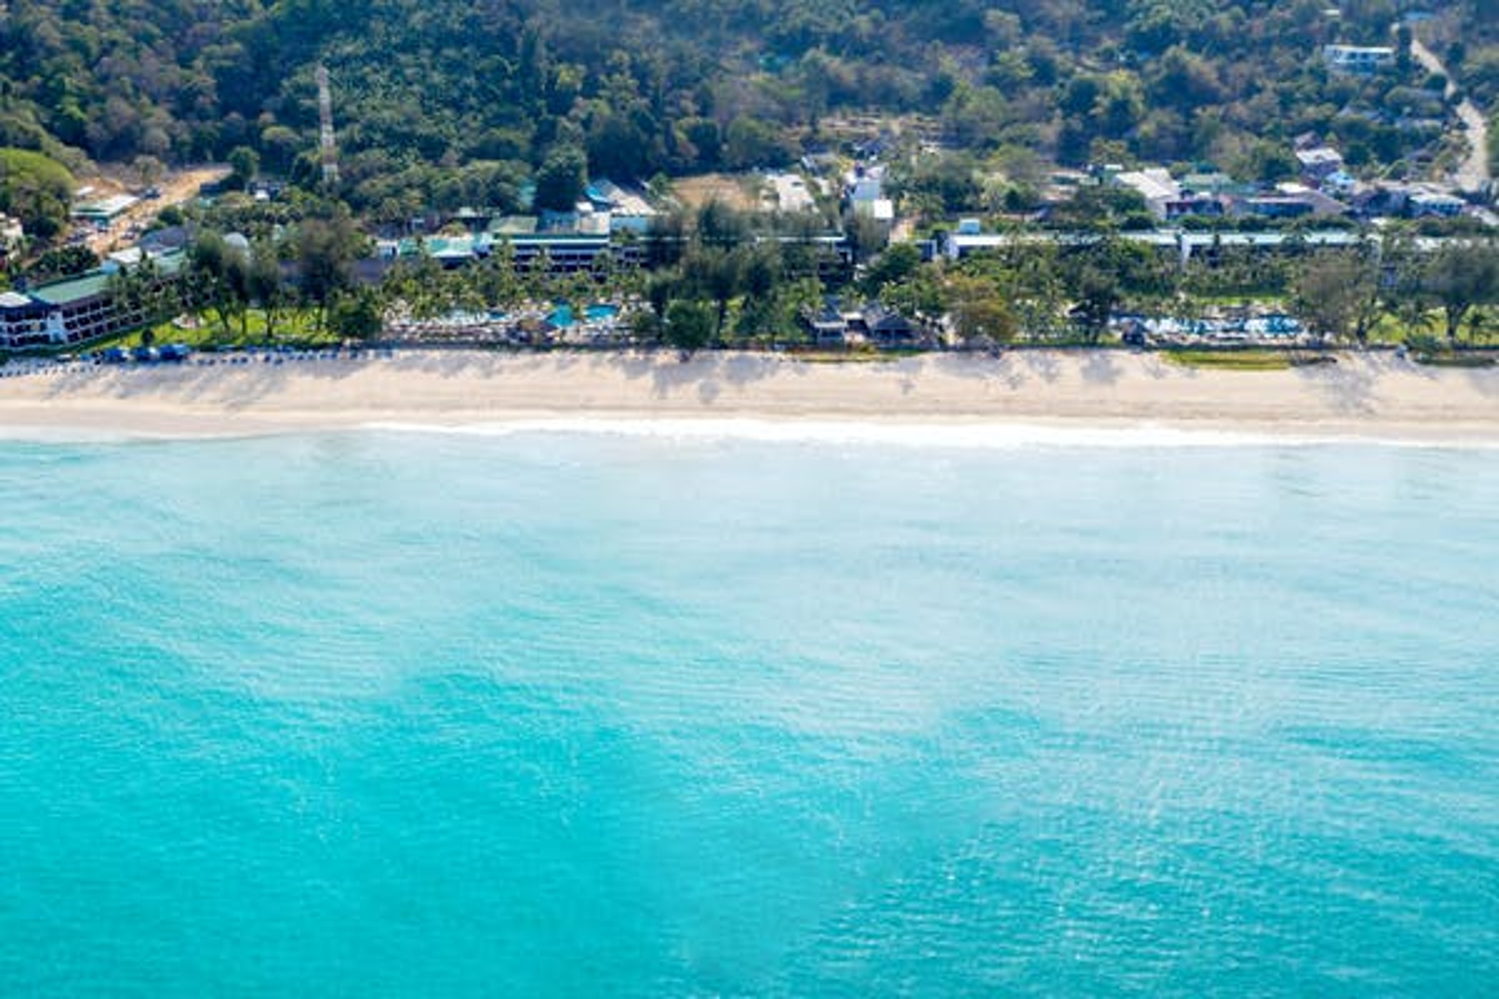 Katathani Phuket Beach Resort - Image 1